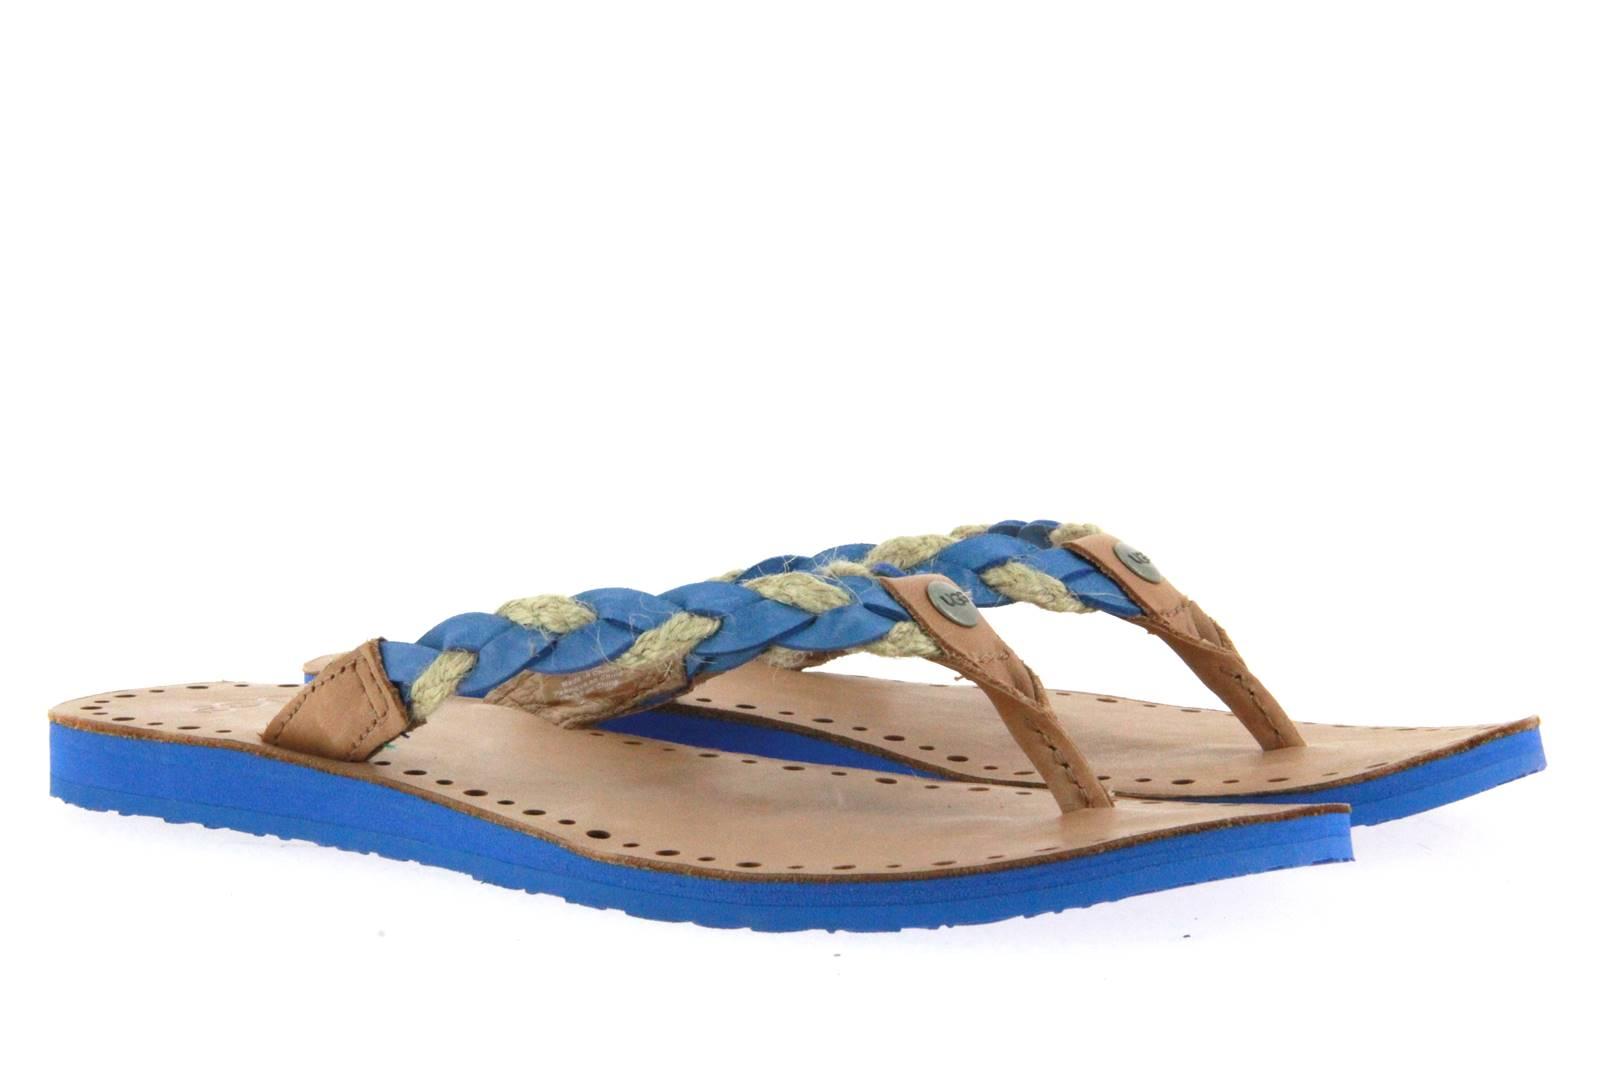 UGG Australia flip flop W NAVY BLUE